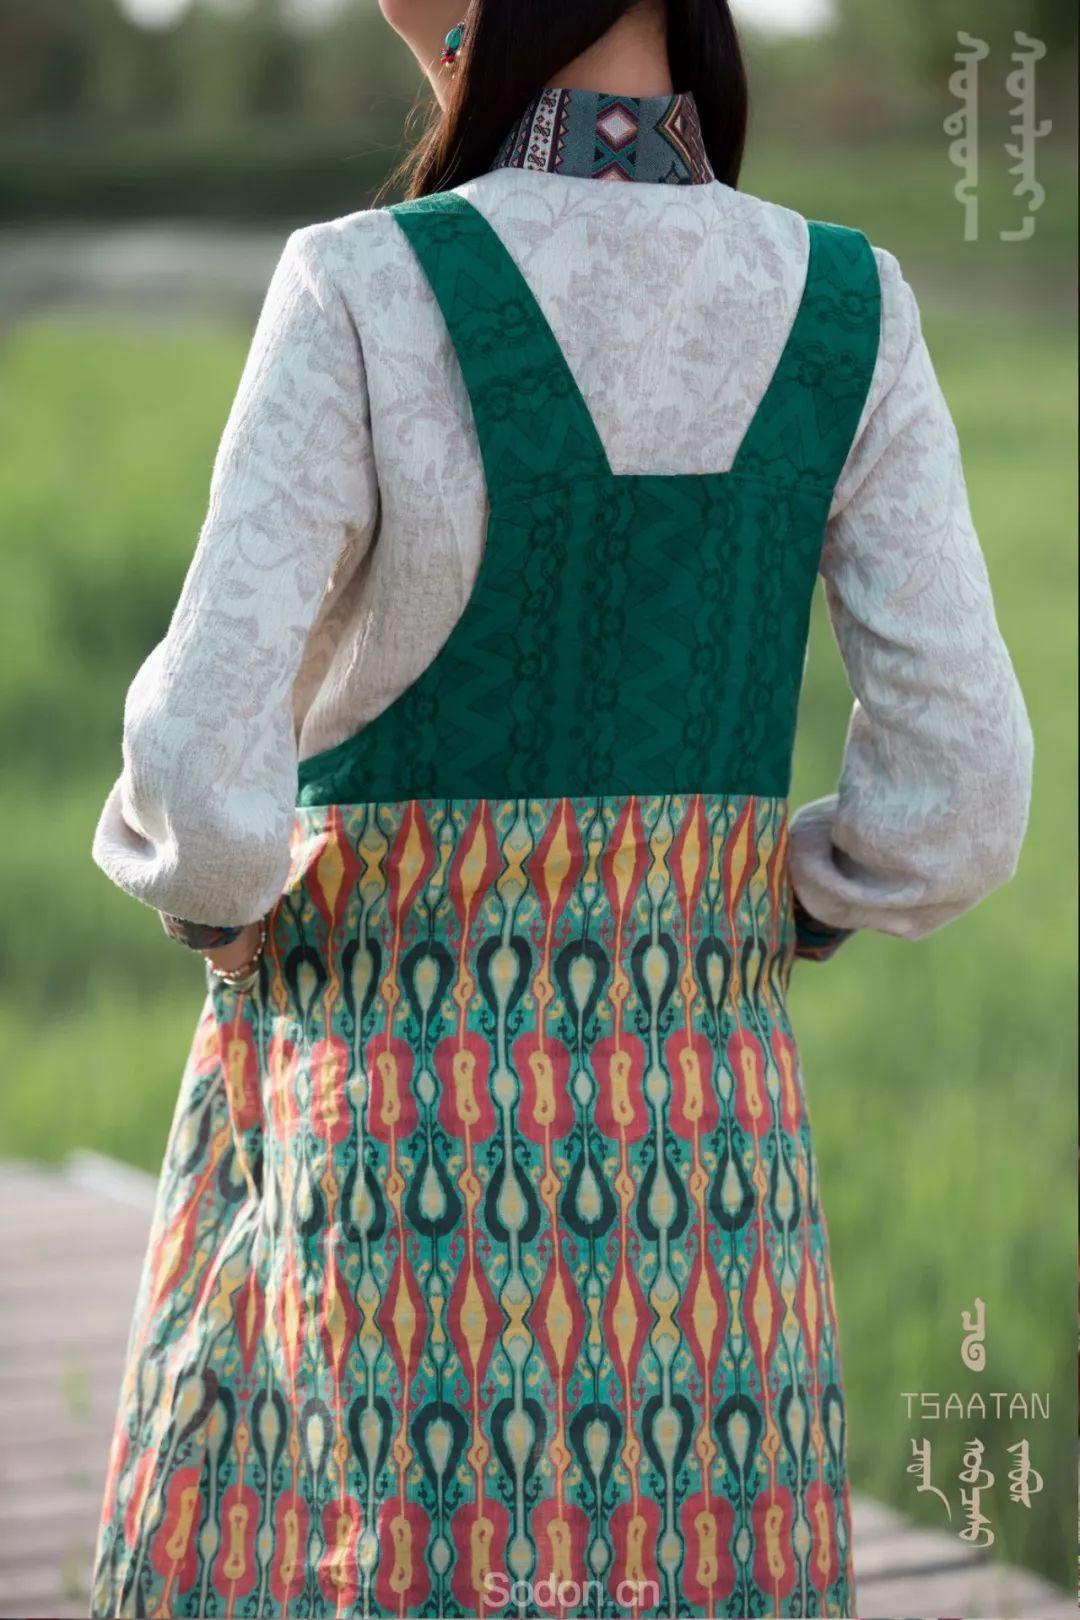 TSAATAN蒙古时装 2019夏季新款首发 第78张